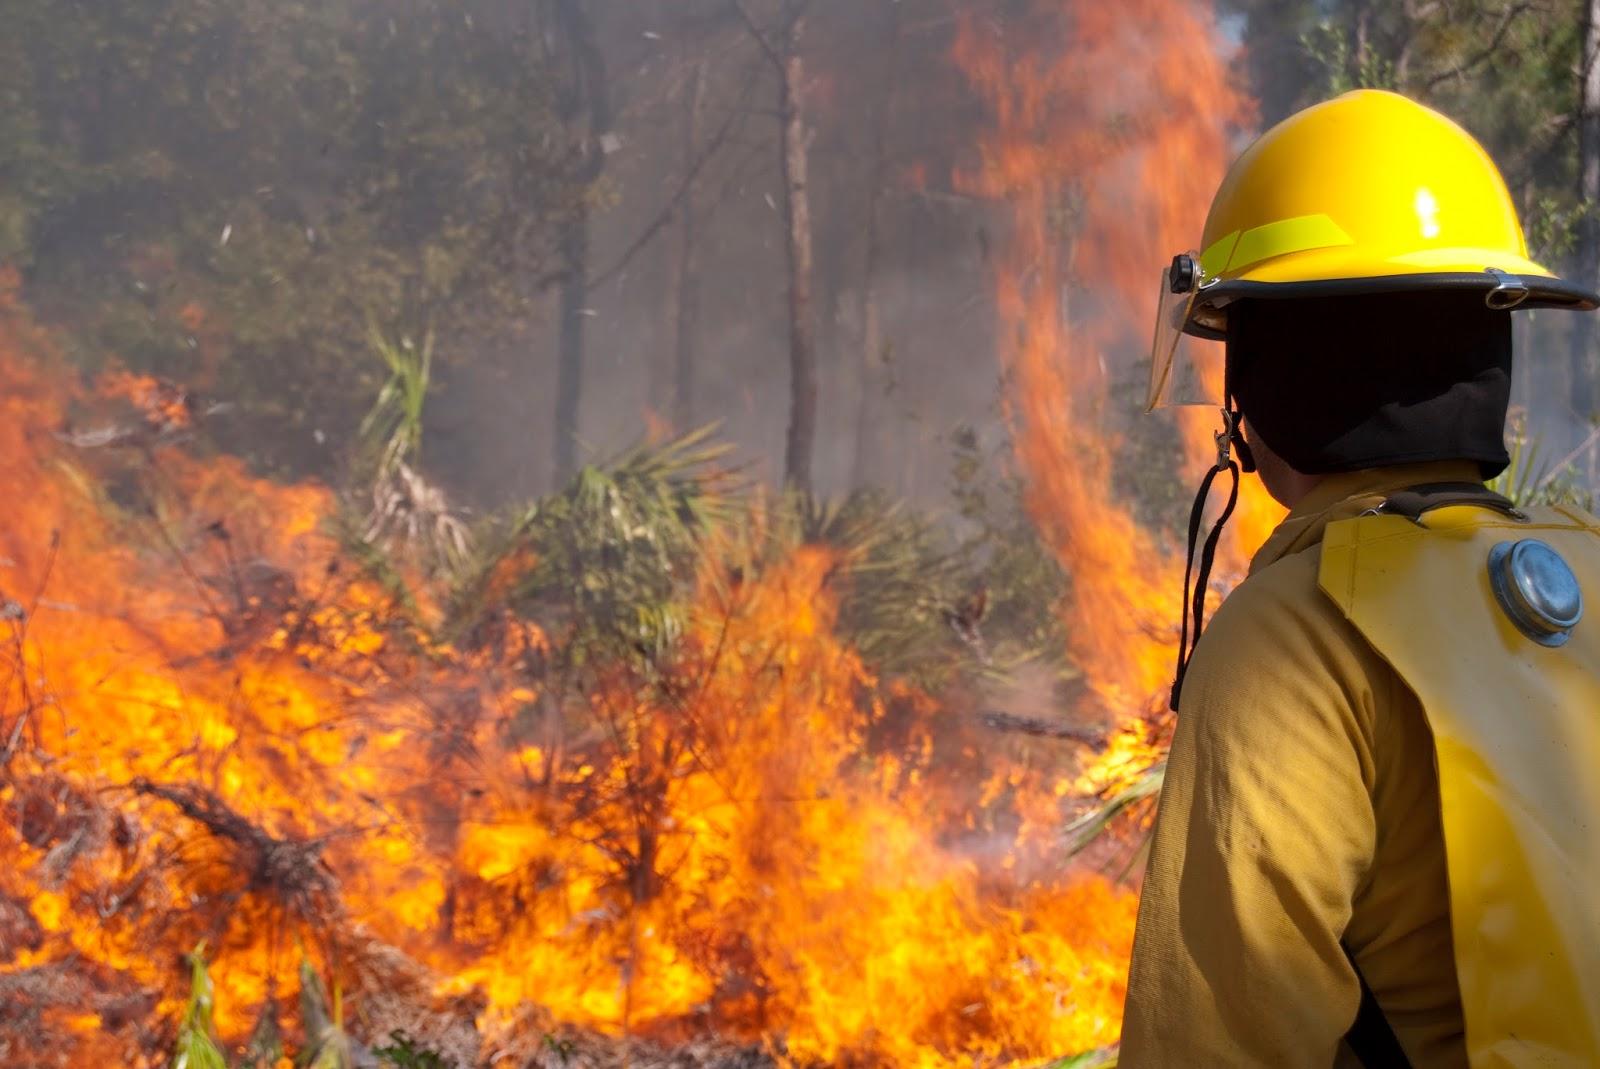 NFPA 1143-2014 Wildland fire